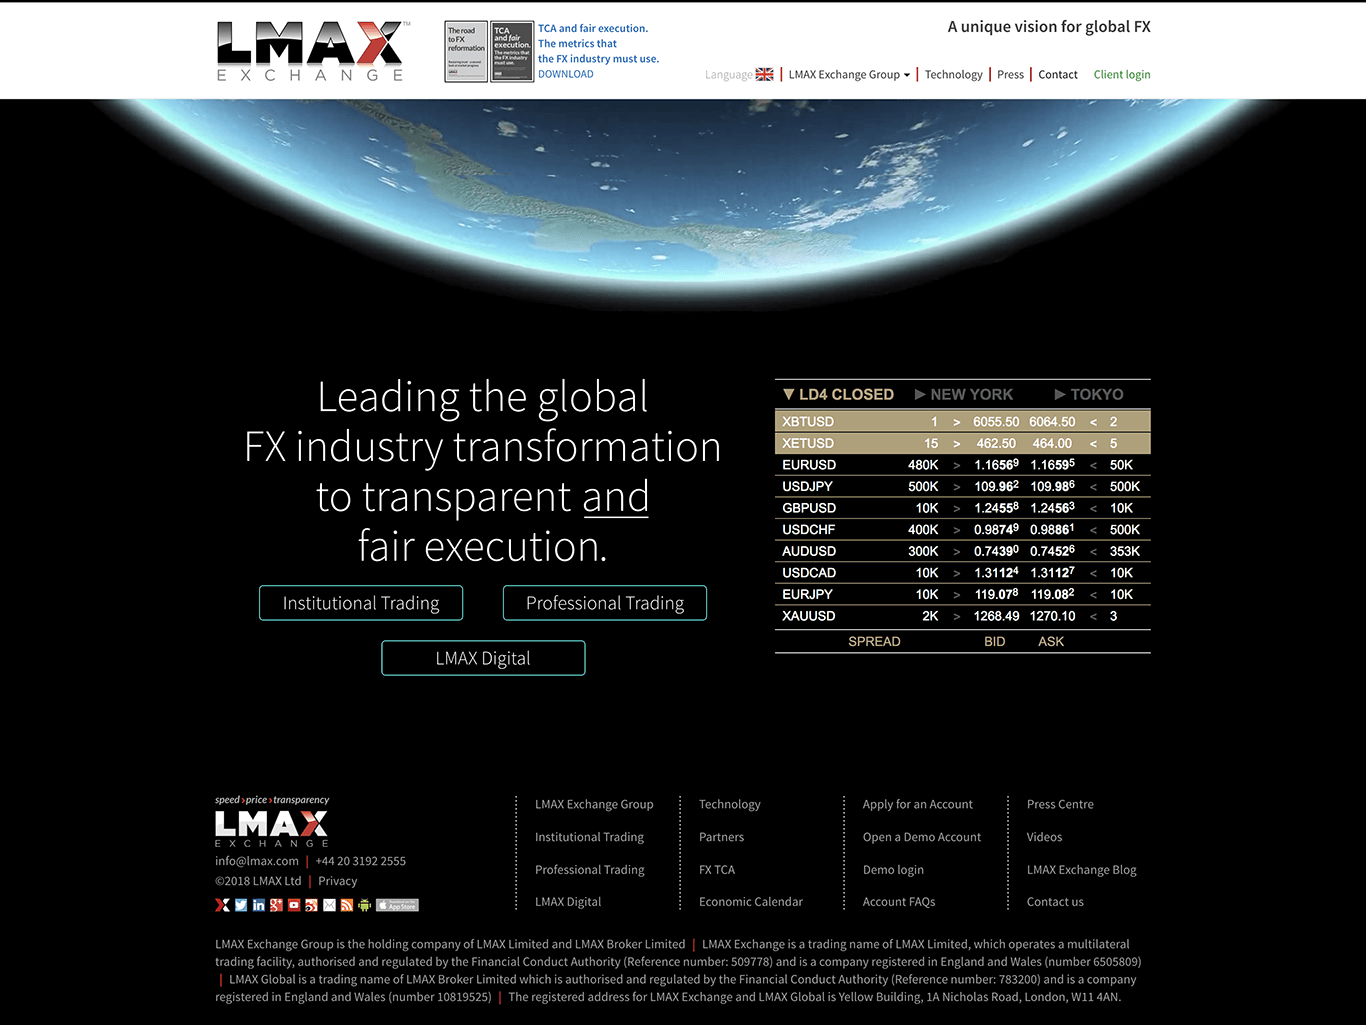 Forex Brokers with LMAX Platform